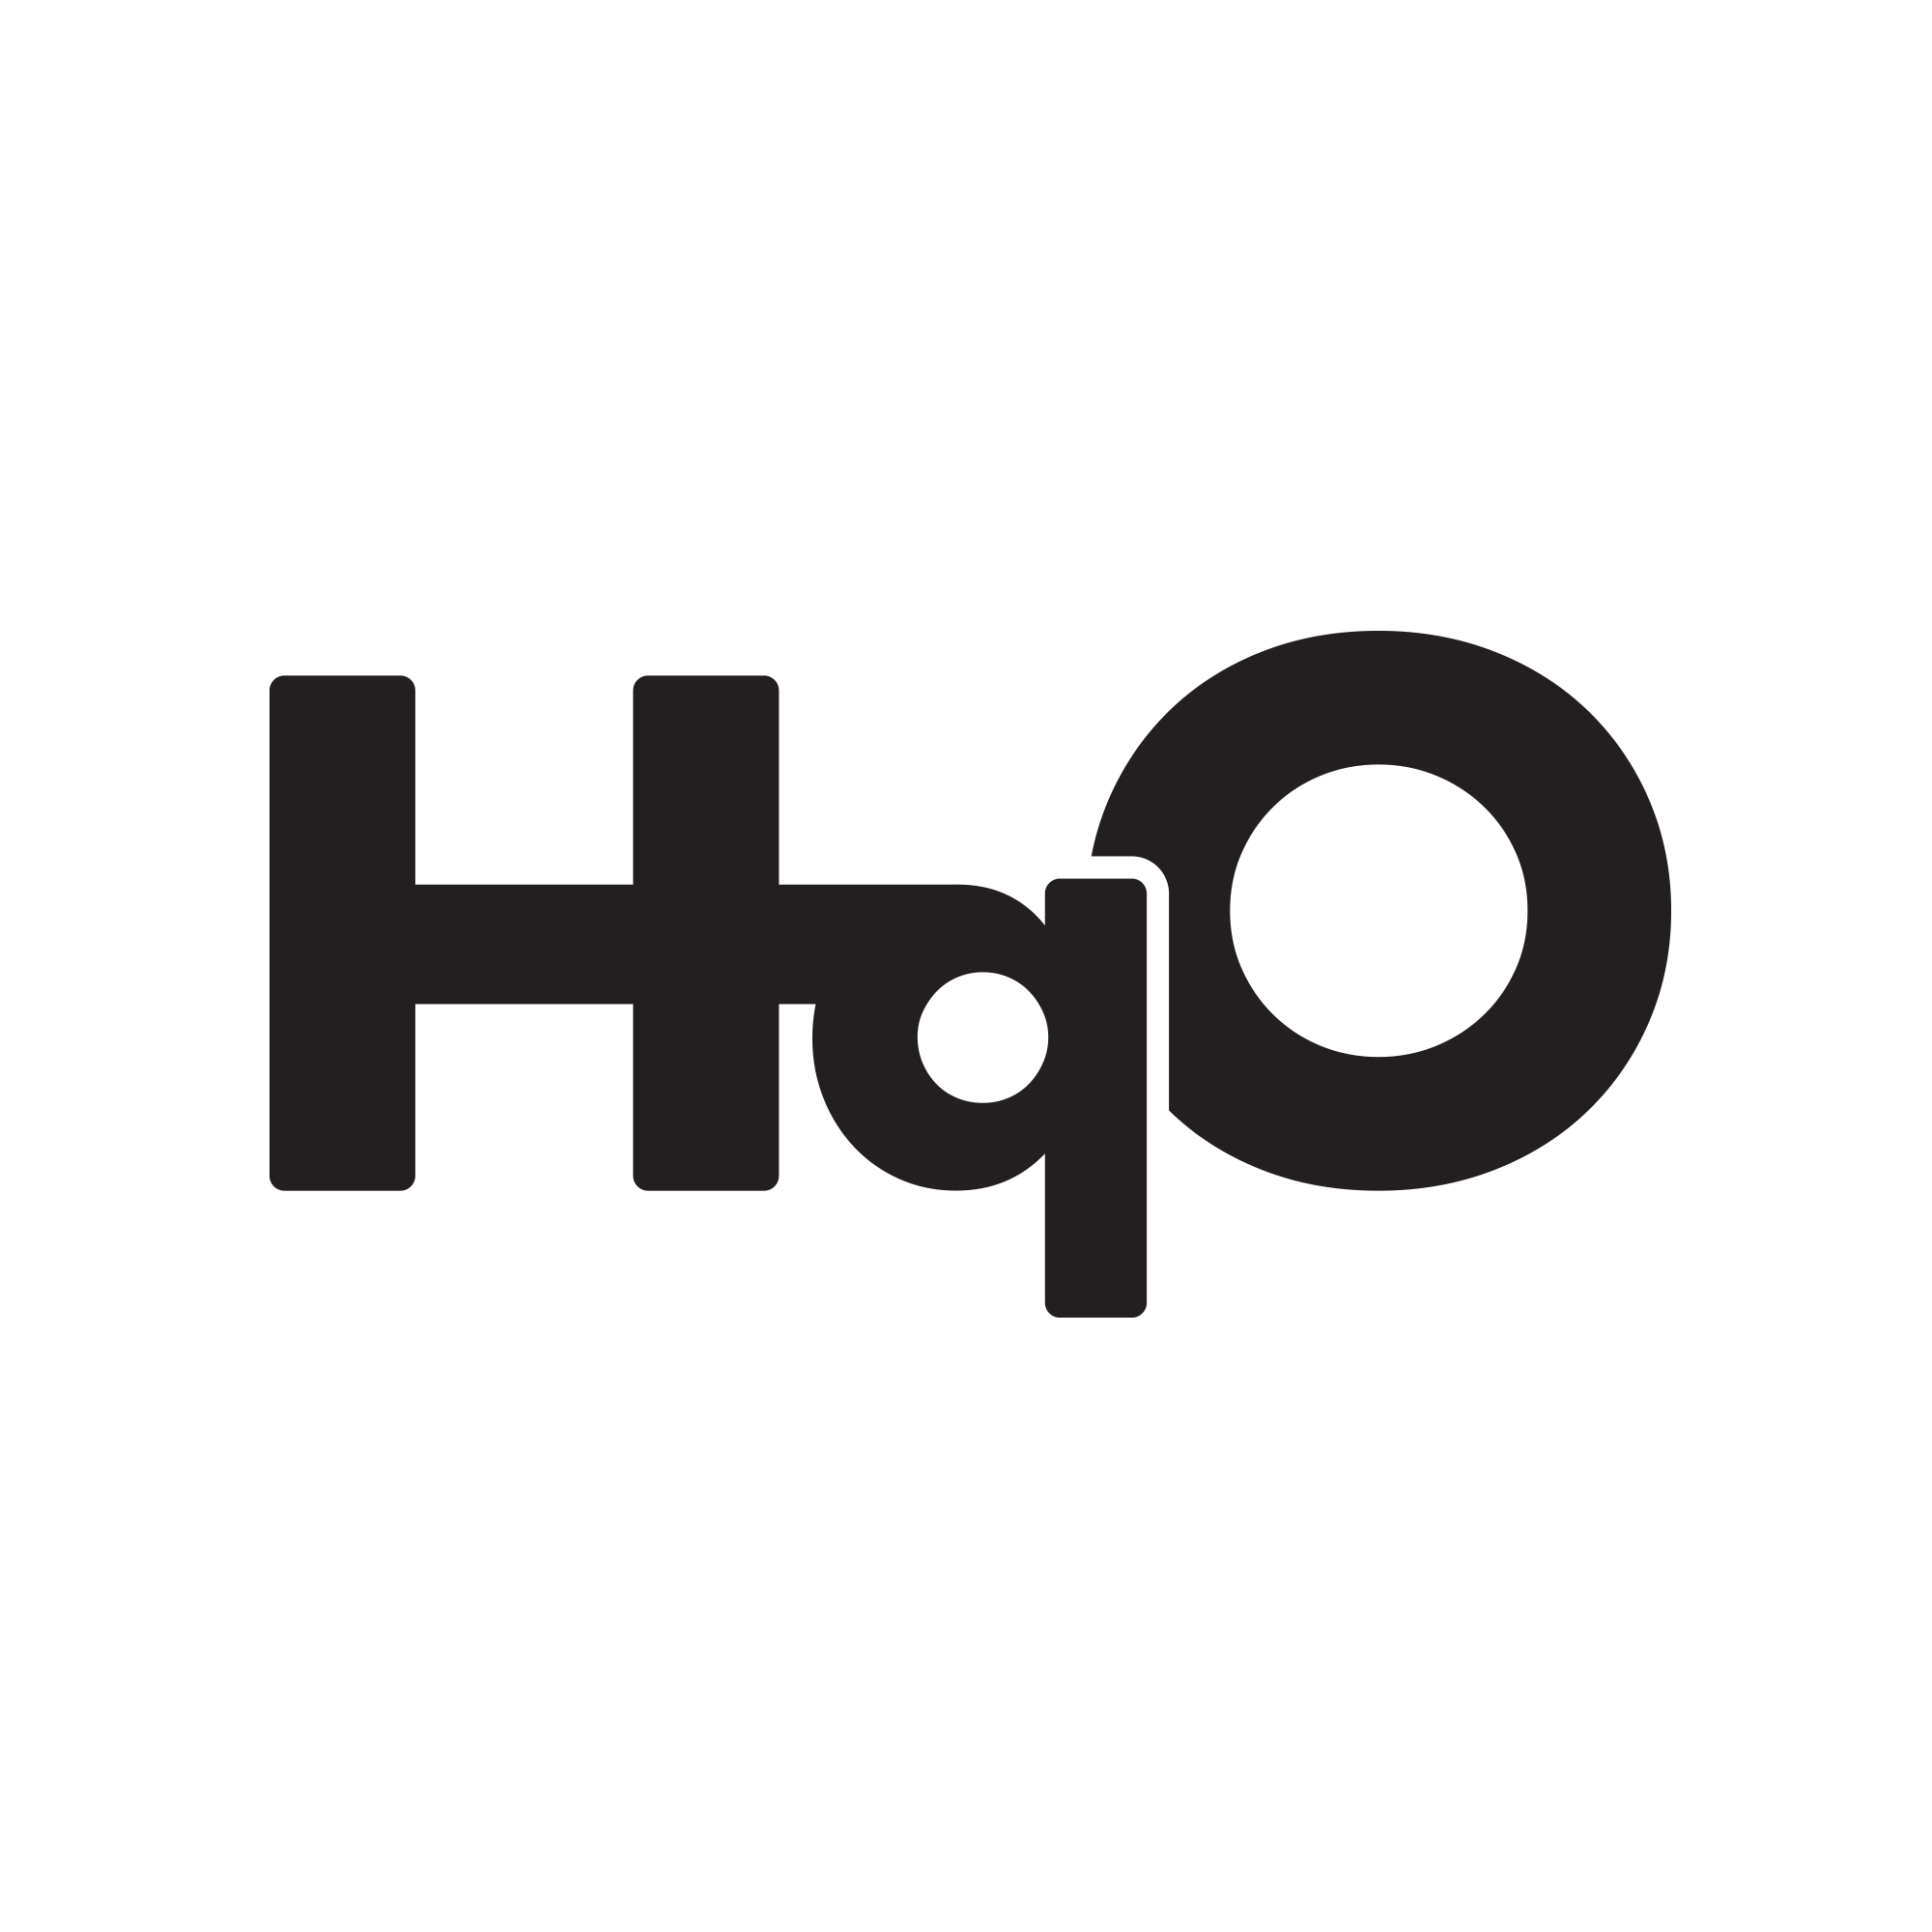 HqO logo